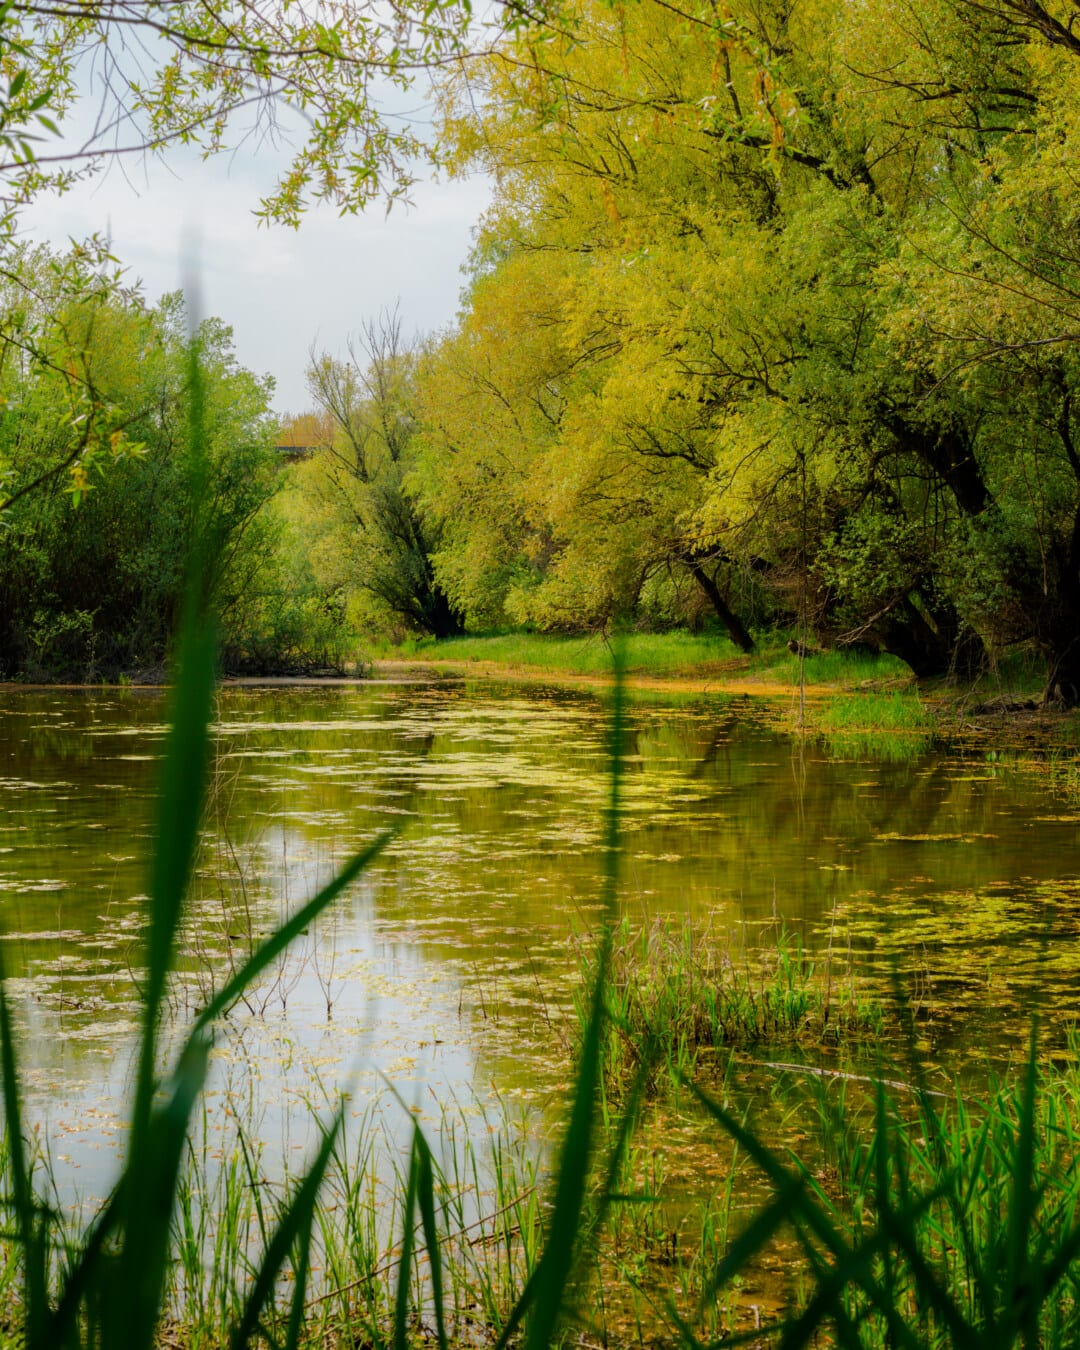 swamp, willowherb, tree, forest, land, wetland, water, pool, lake, landscape